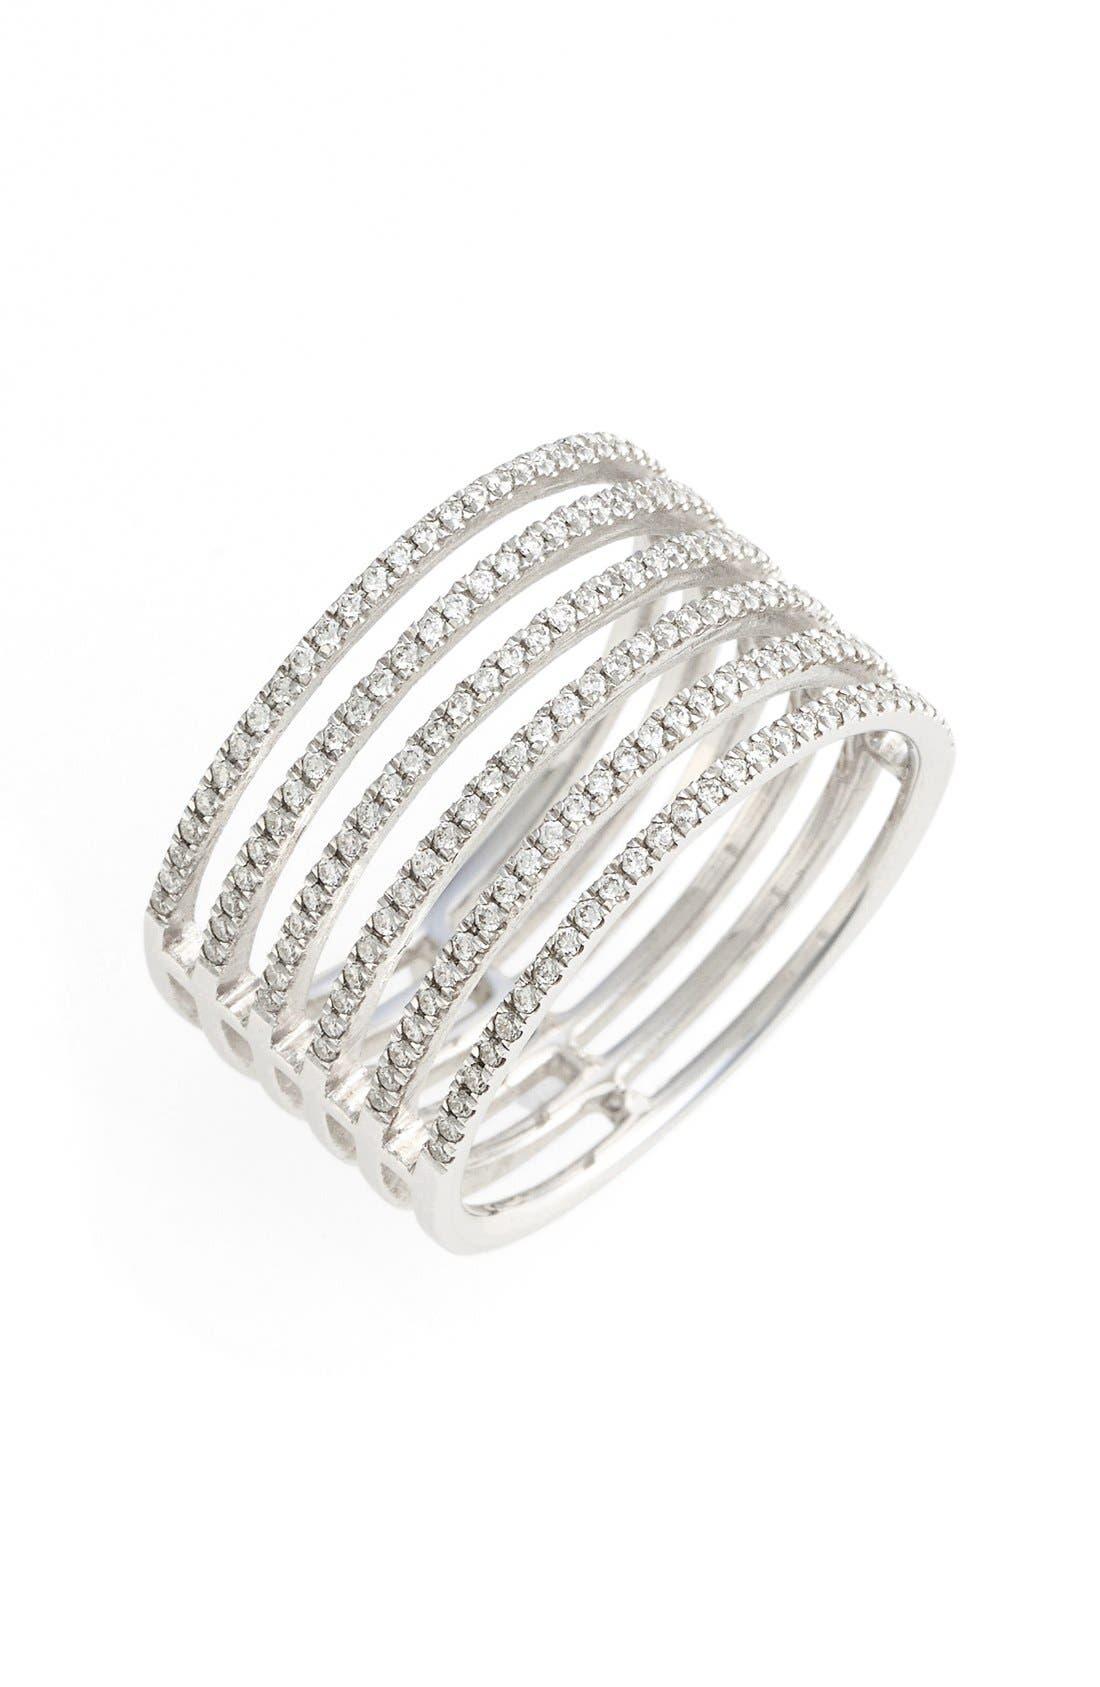 Bony Levy 'Prism' Six-Row Diamond Ring (Nordstrom Exclusive)